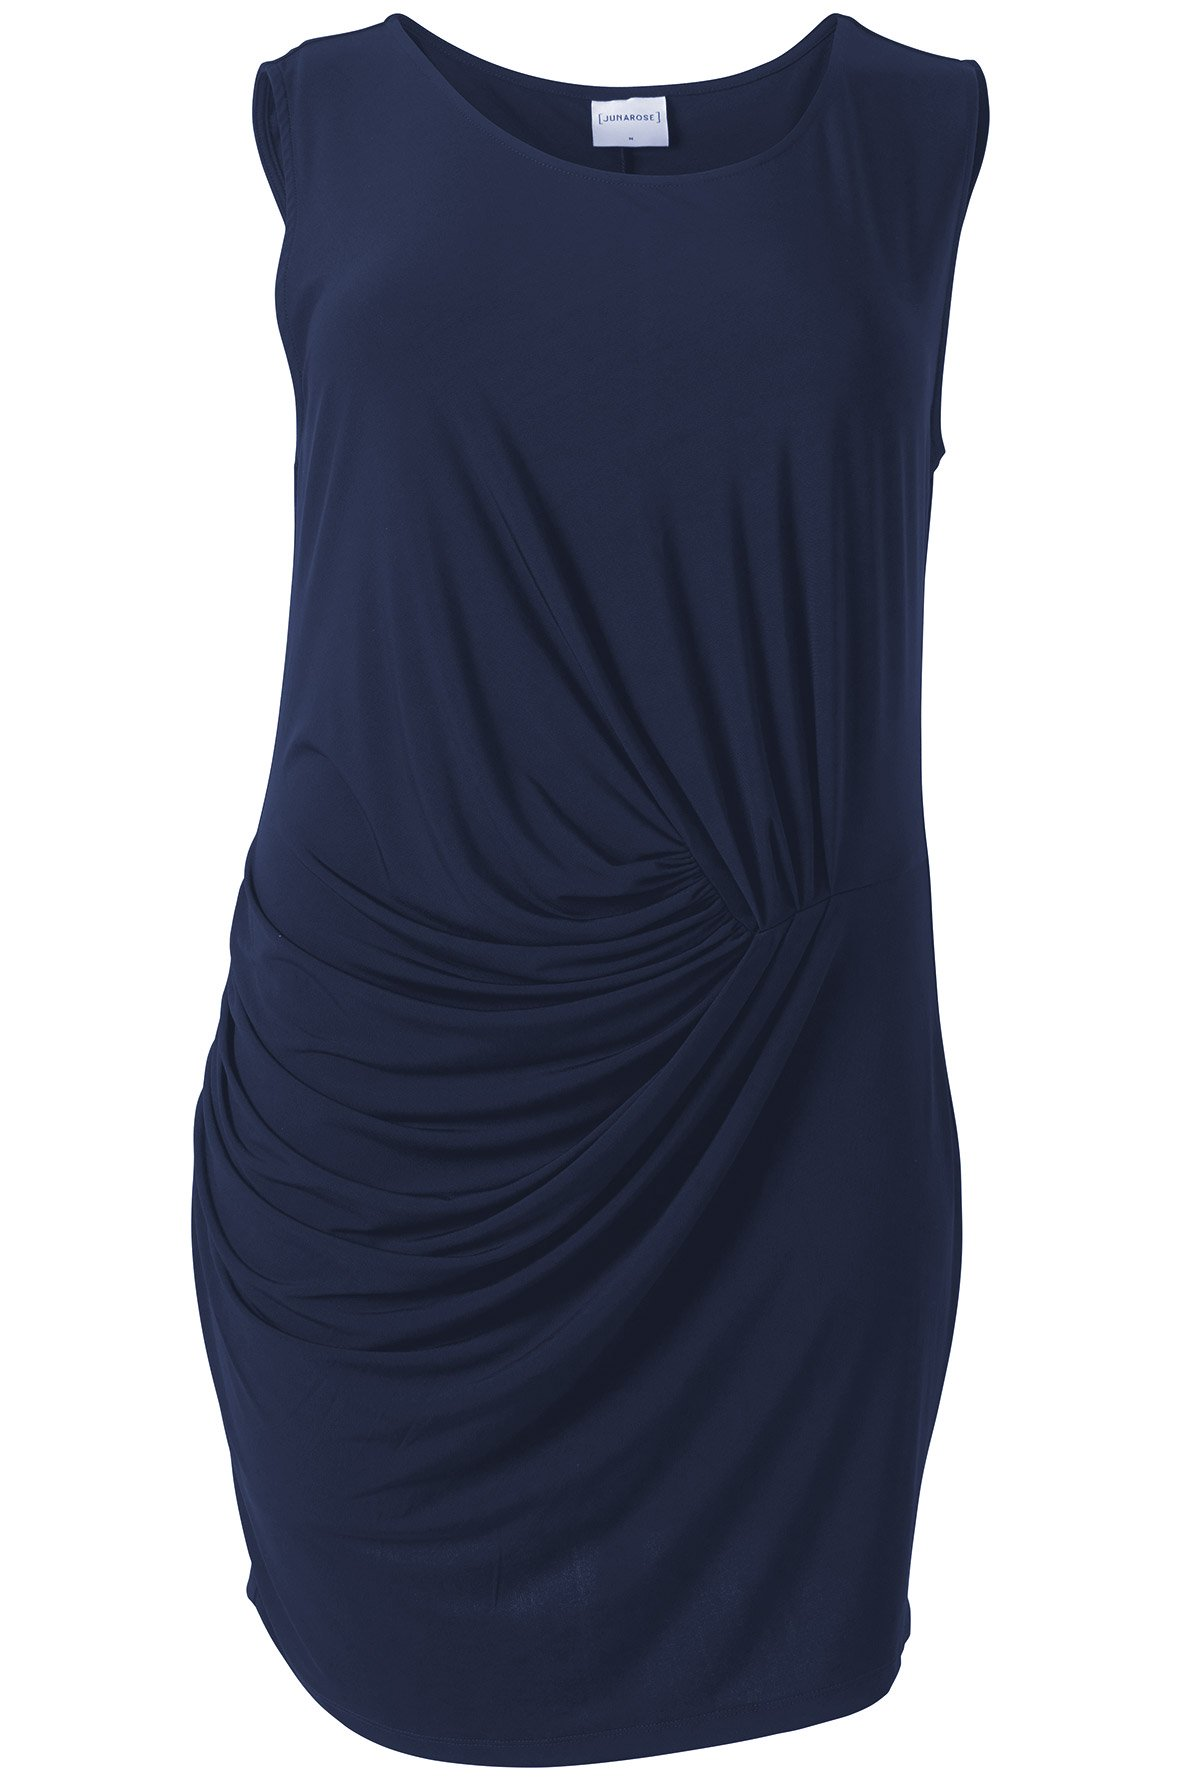 Smuk marineblå kjole med læg og draperinger